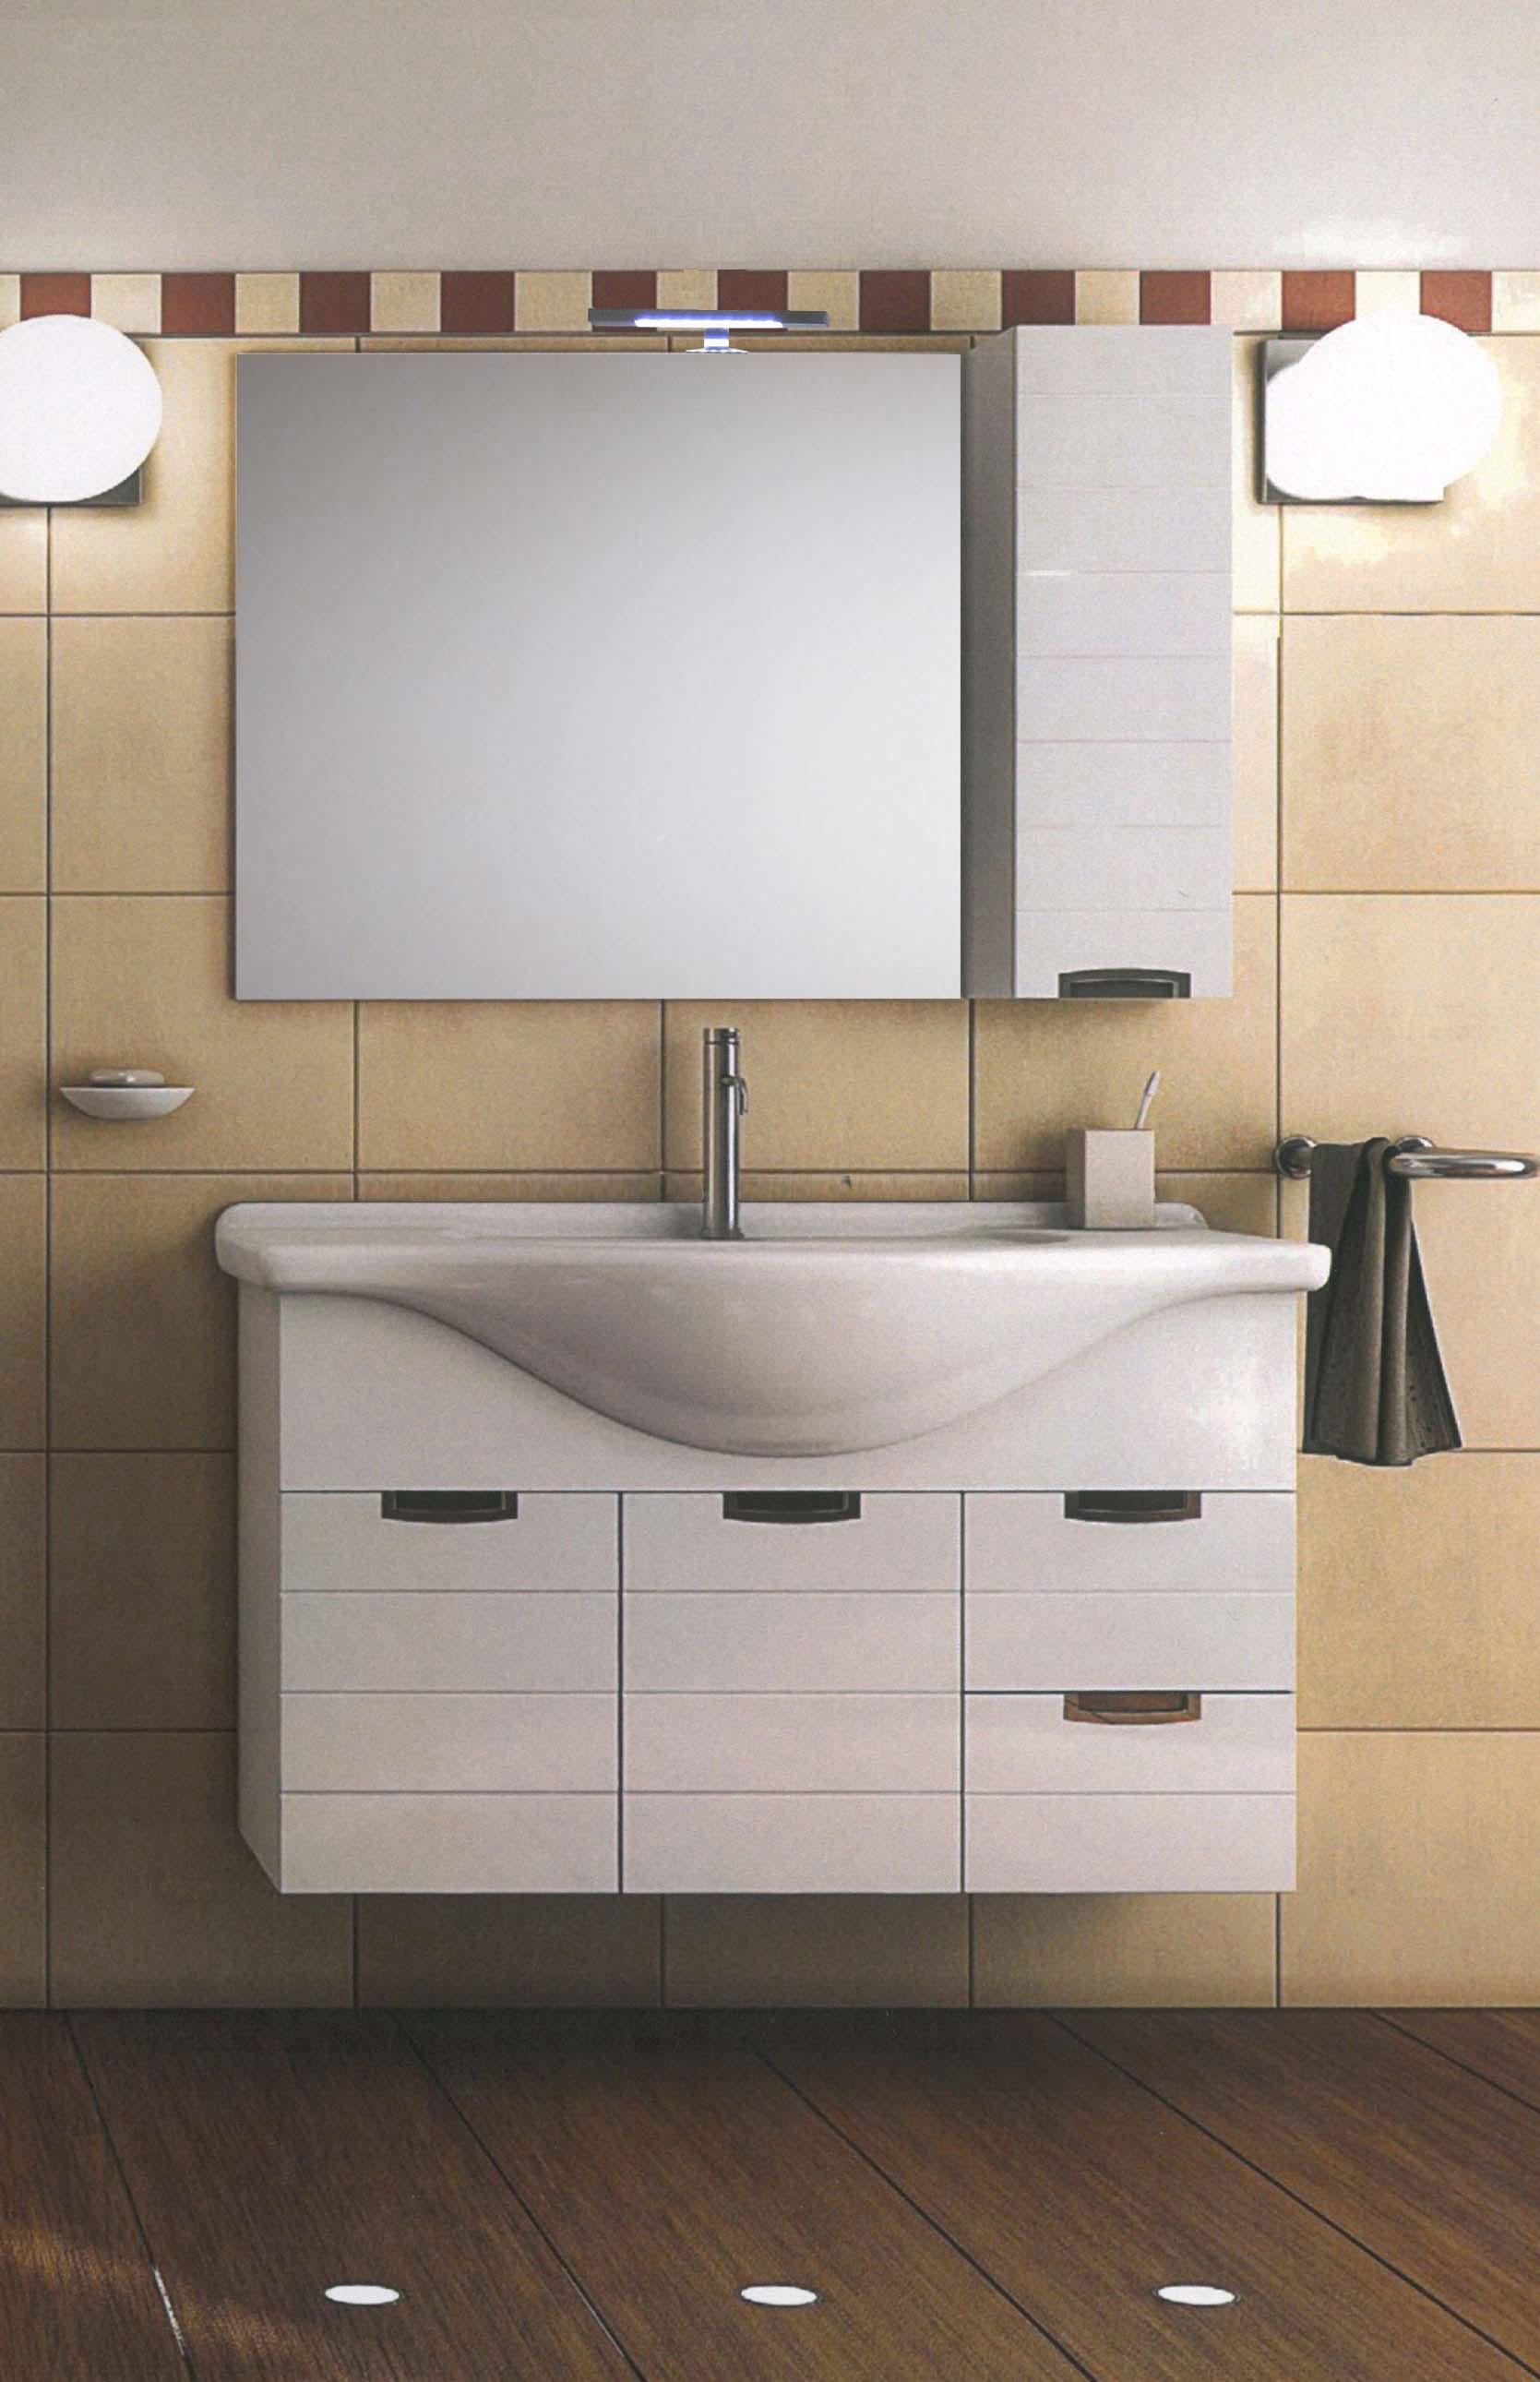 Savini mobili bagno cool email with savini mobili bagno - Gaia mobili bagno prezzi ...